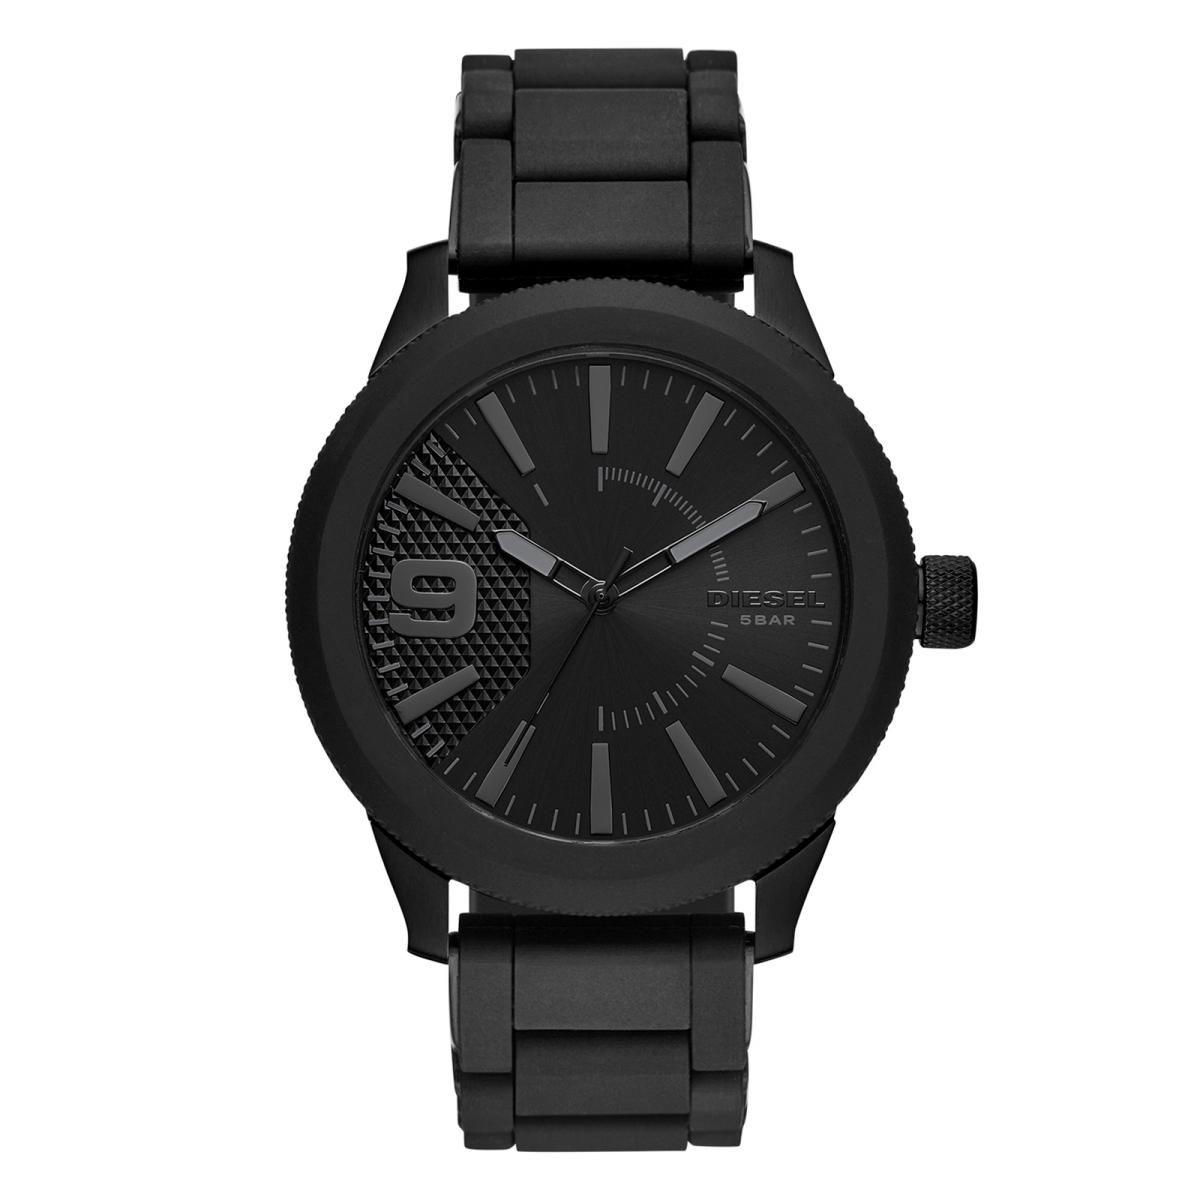 bd7ed9a83d5f Reloj Diesel - DZ1873 - Hombre - Time Square